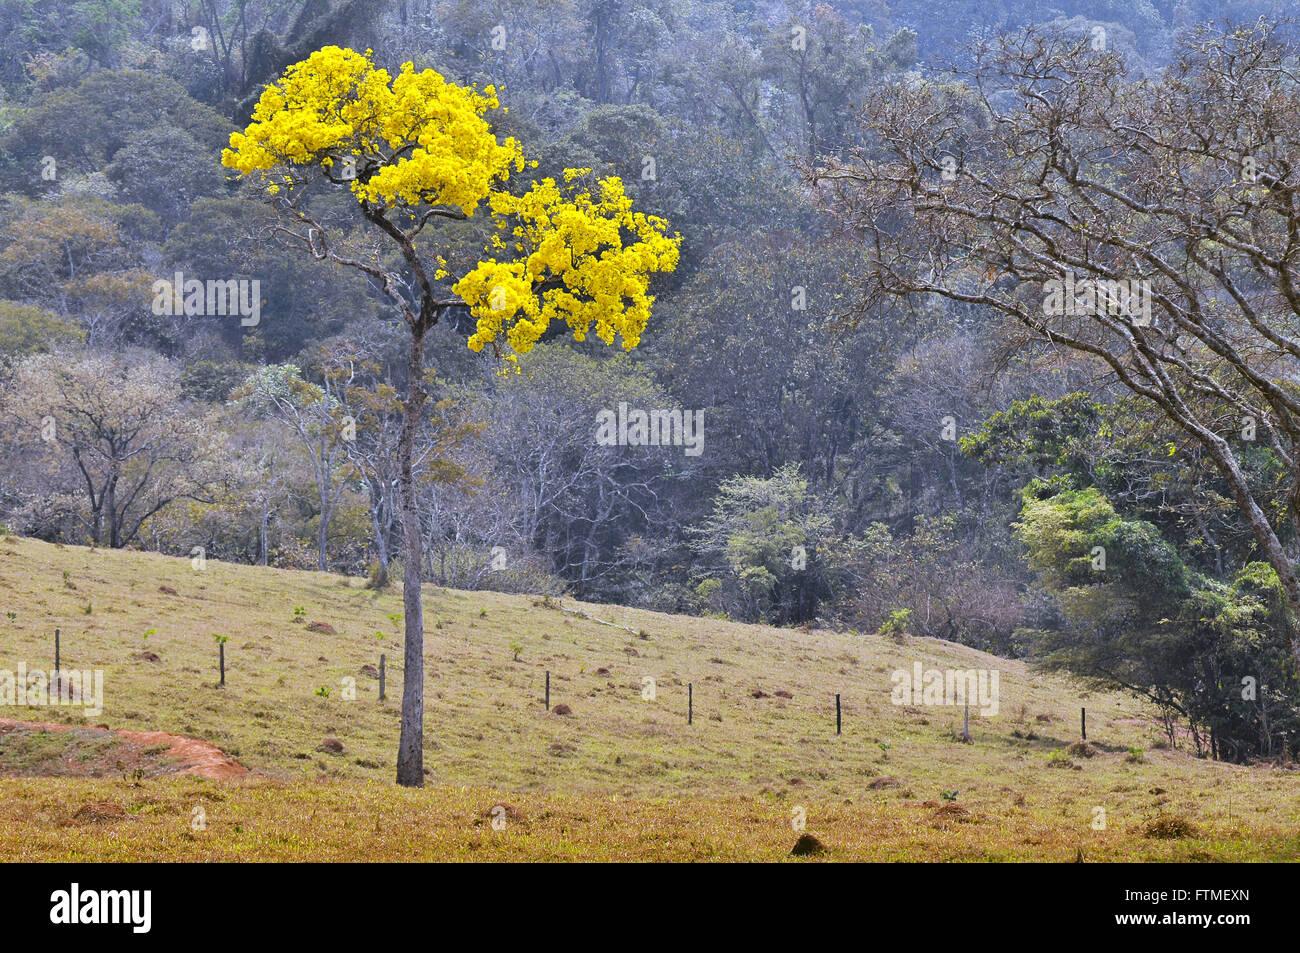 Ipe amarillo florido Imagen De Stock